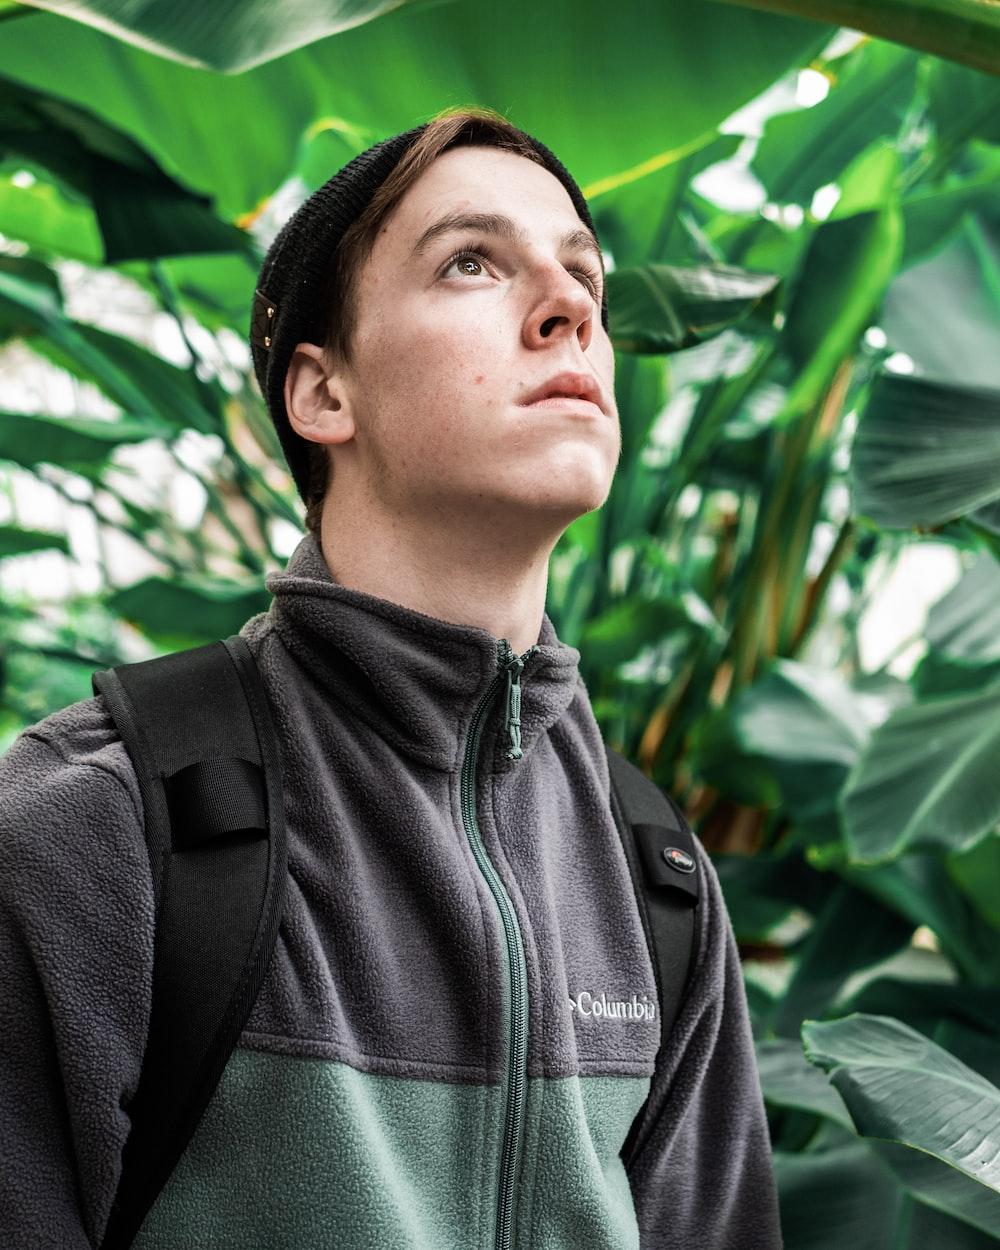 man in gray Columbia jacket beside plants